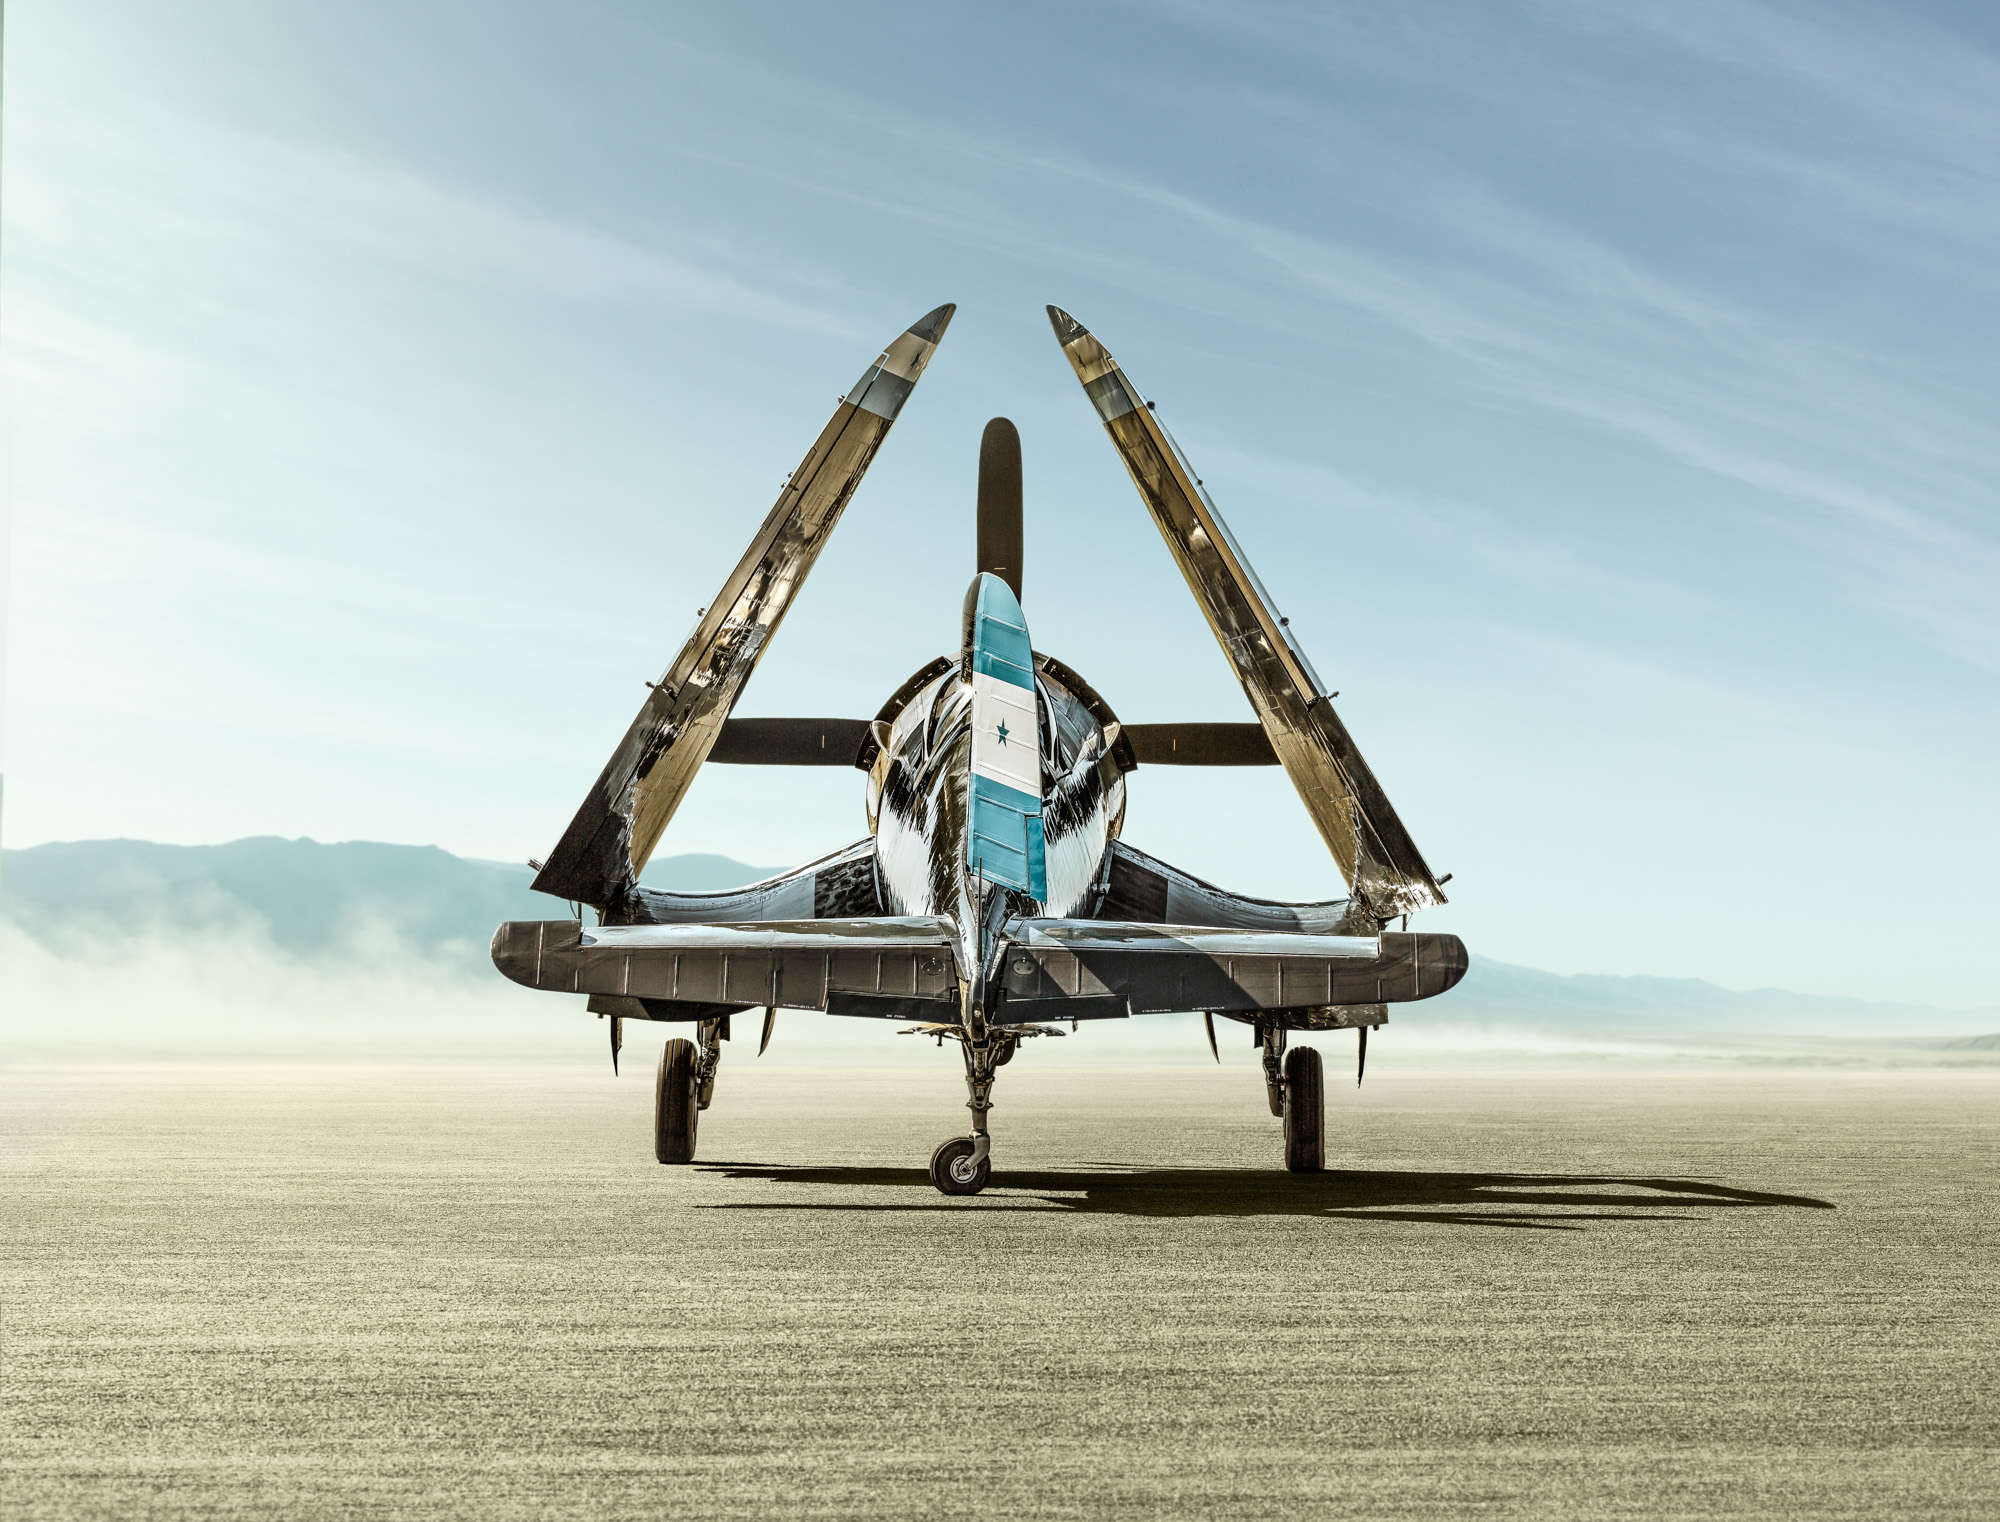 Gary Sheppard - Vought F4U Corsair on dry lake bed II